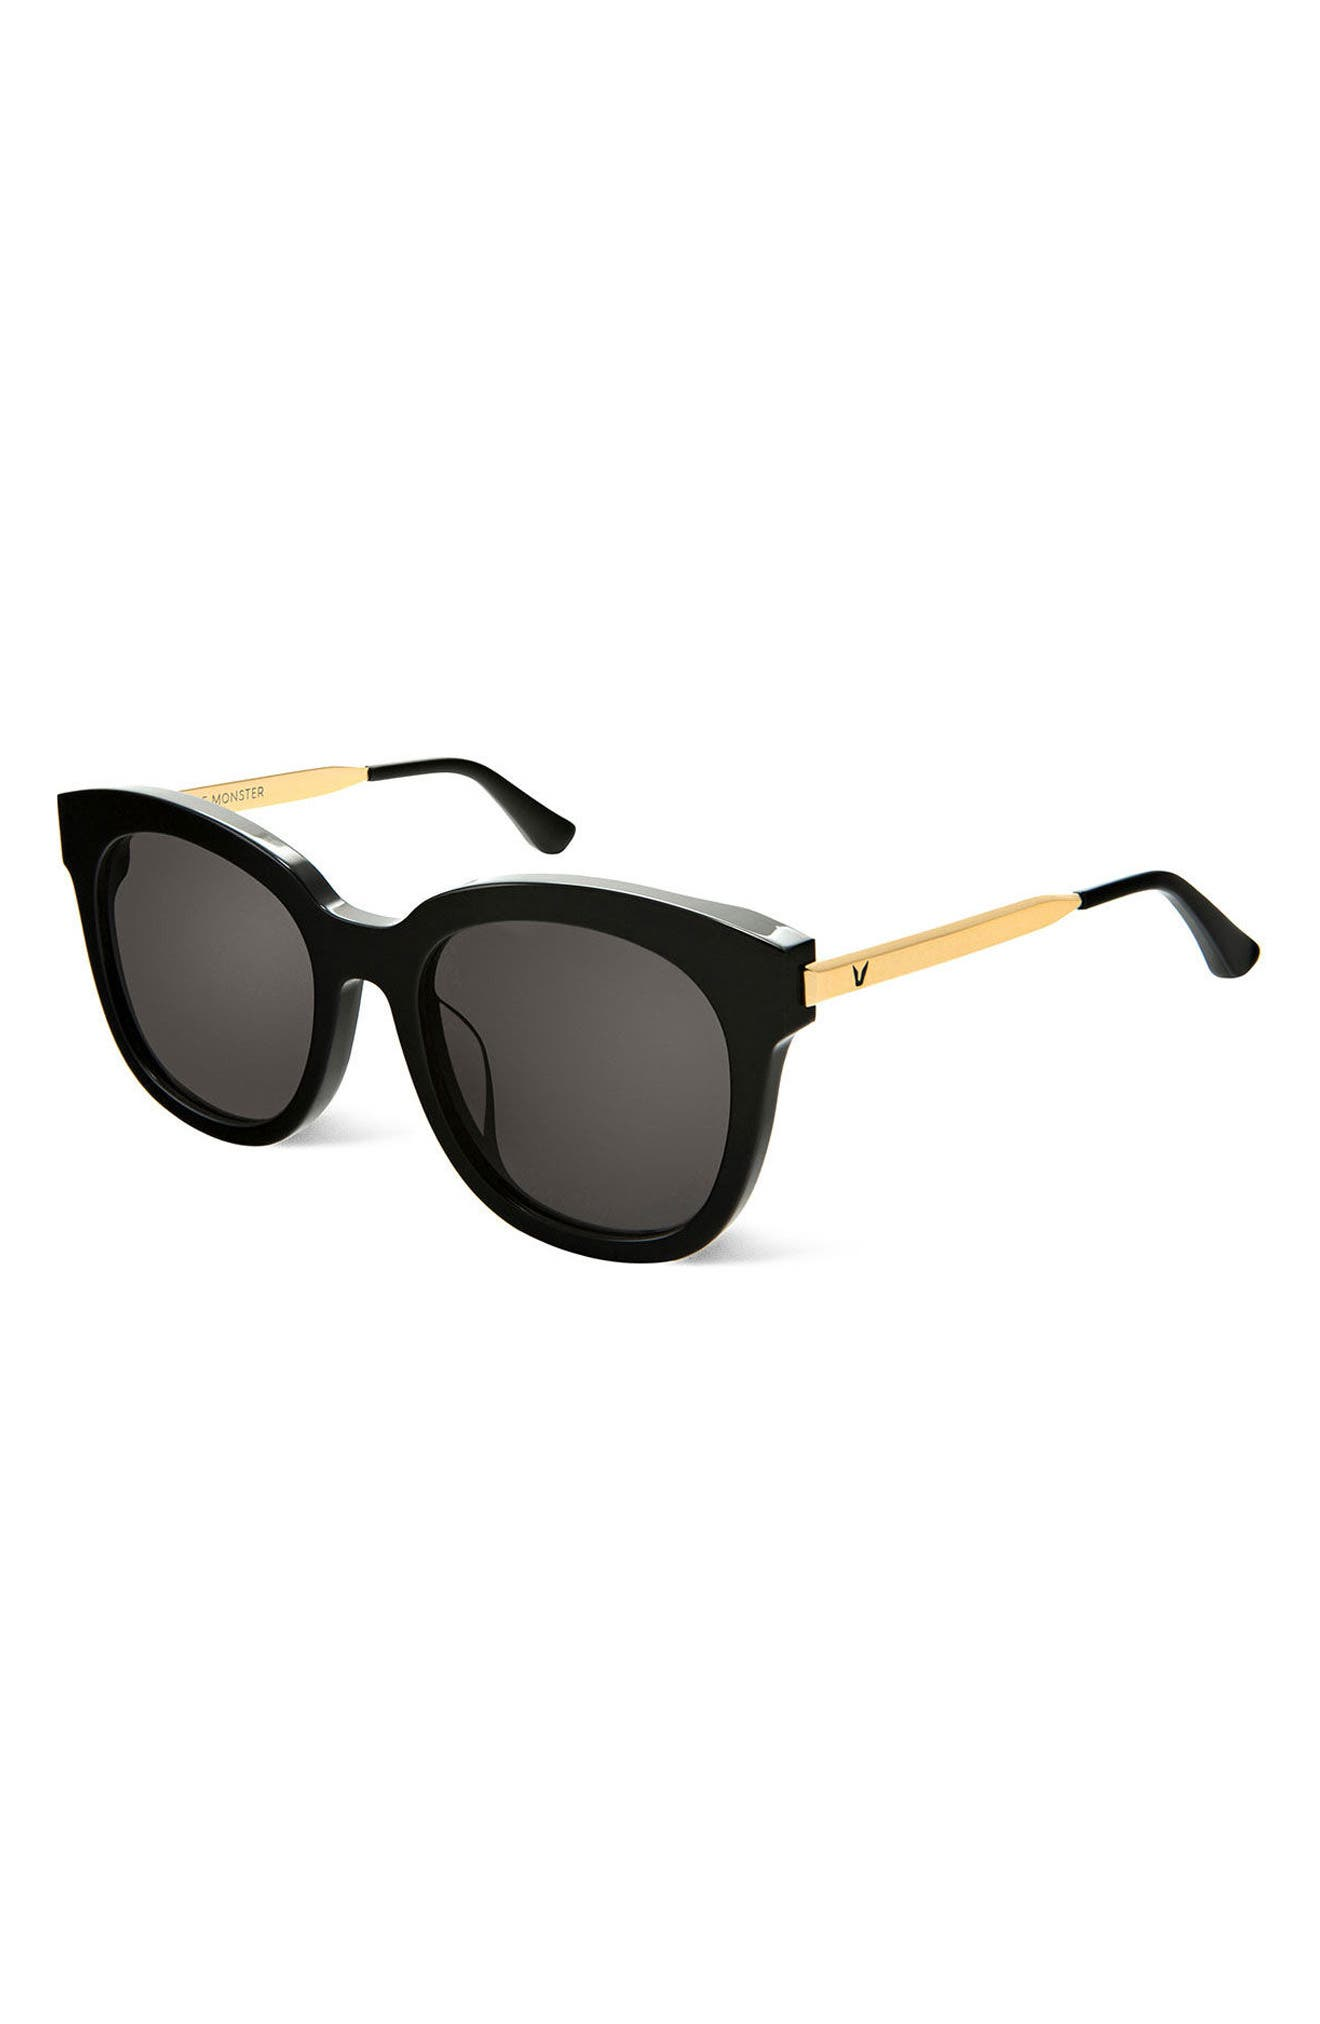 Cuba 55mm Sunglasses,                             Alternate thumbnail 3, color,                             001